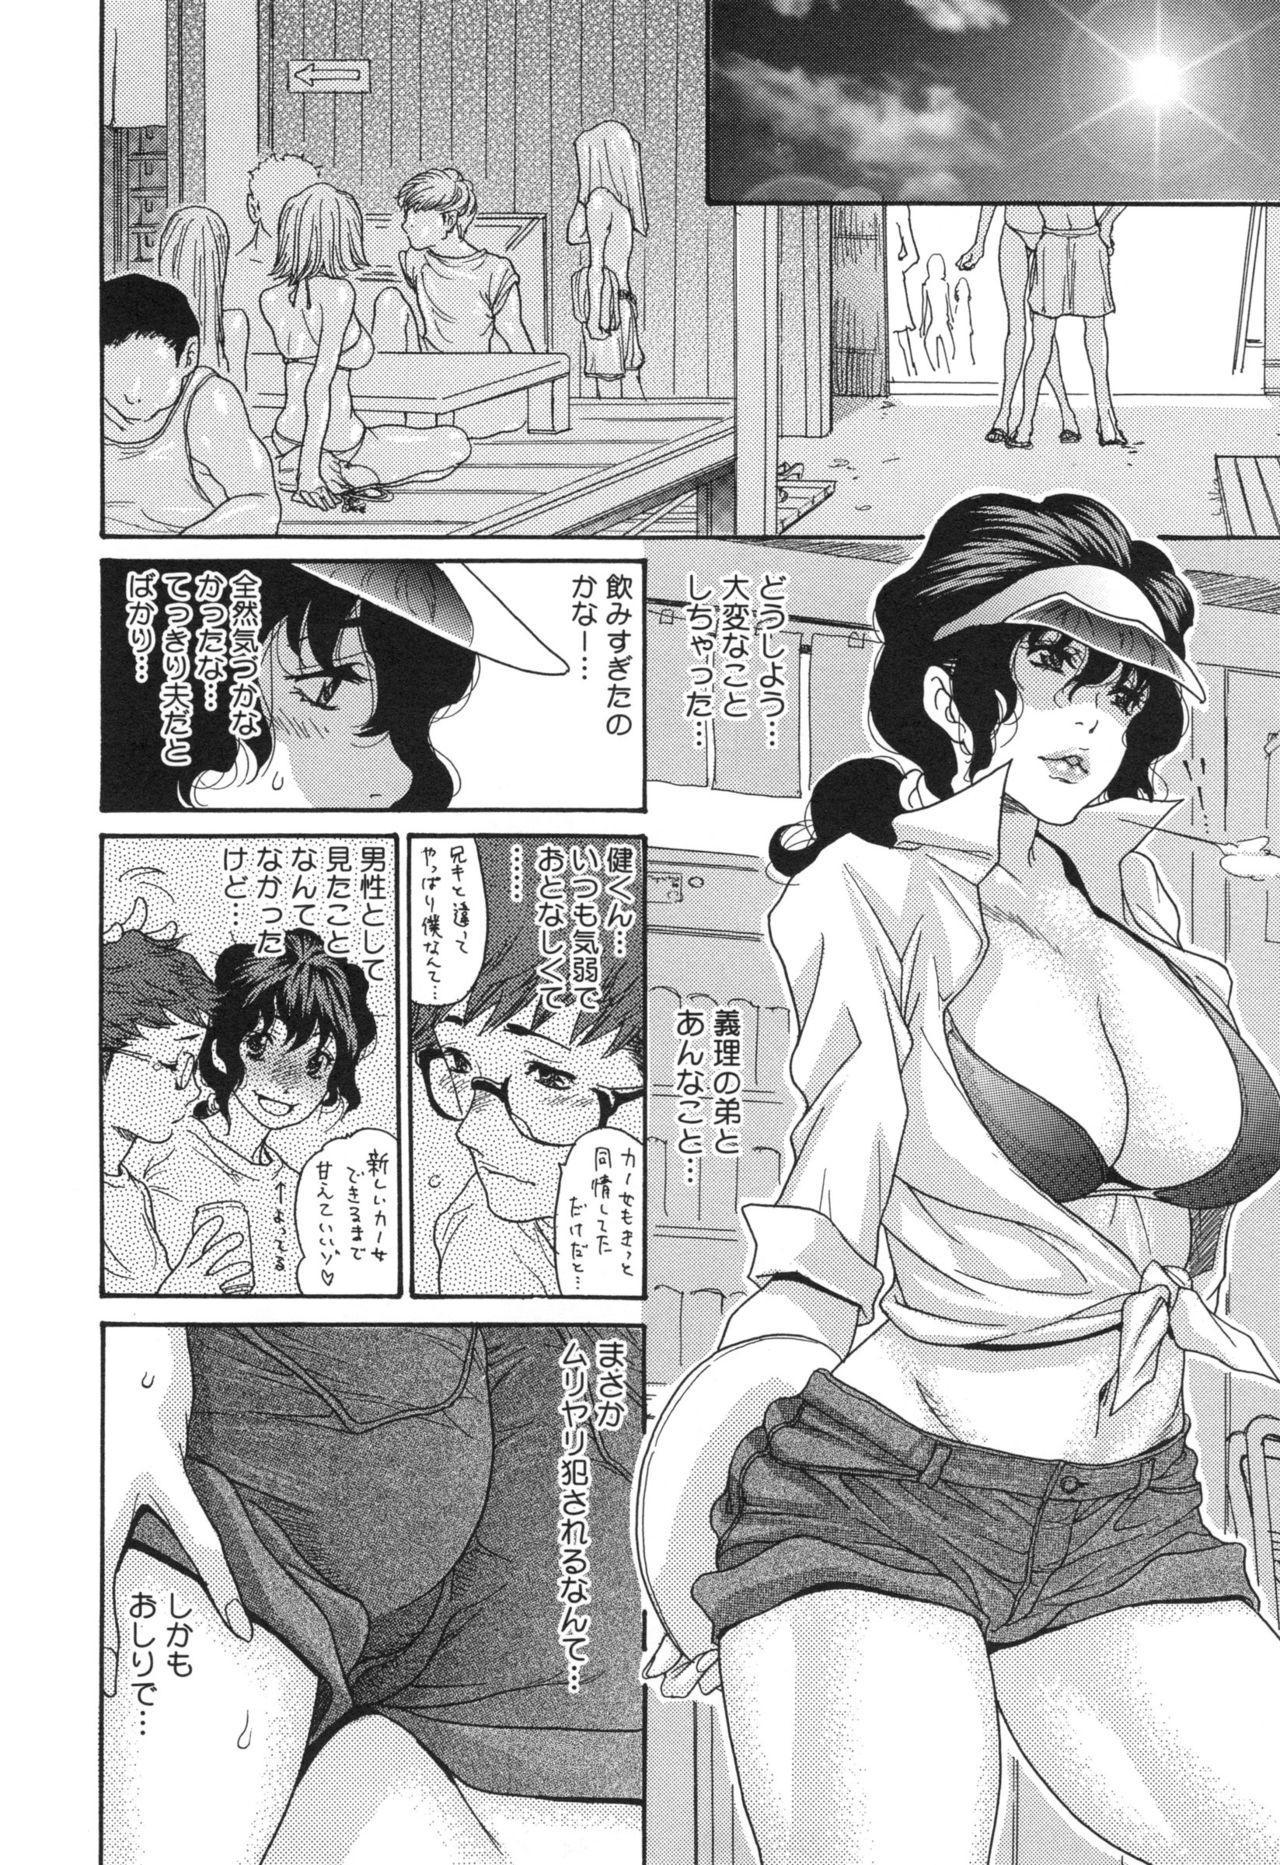 Niku-zuma Netorare Maniacs 96